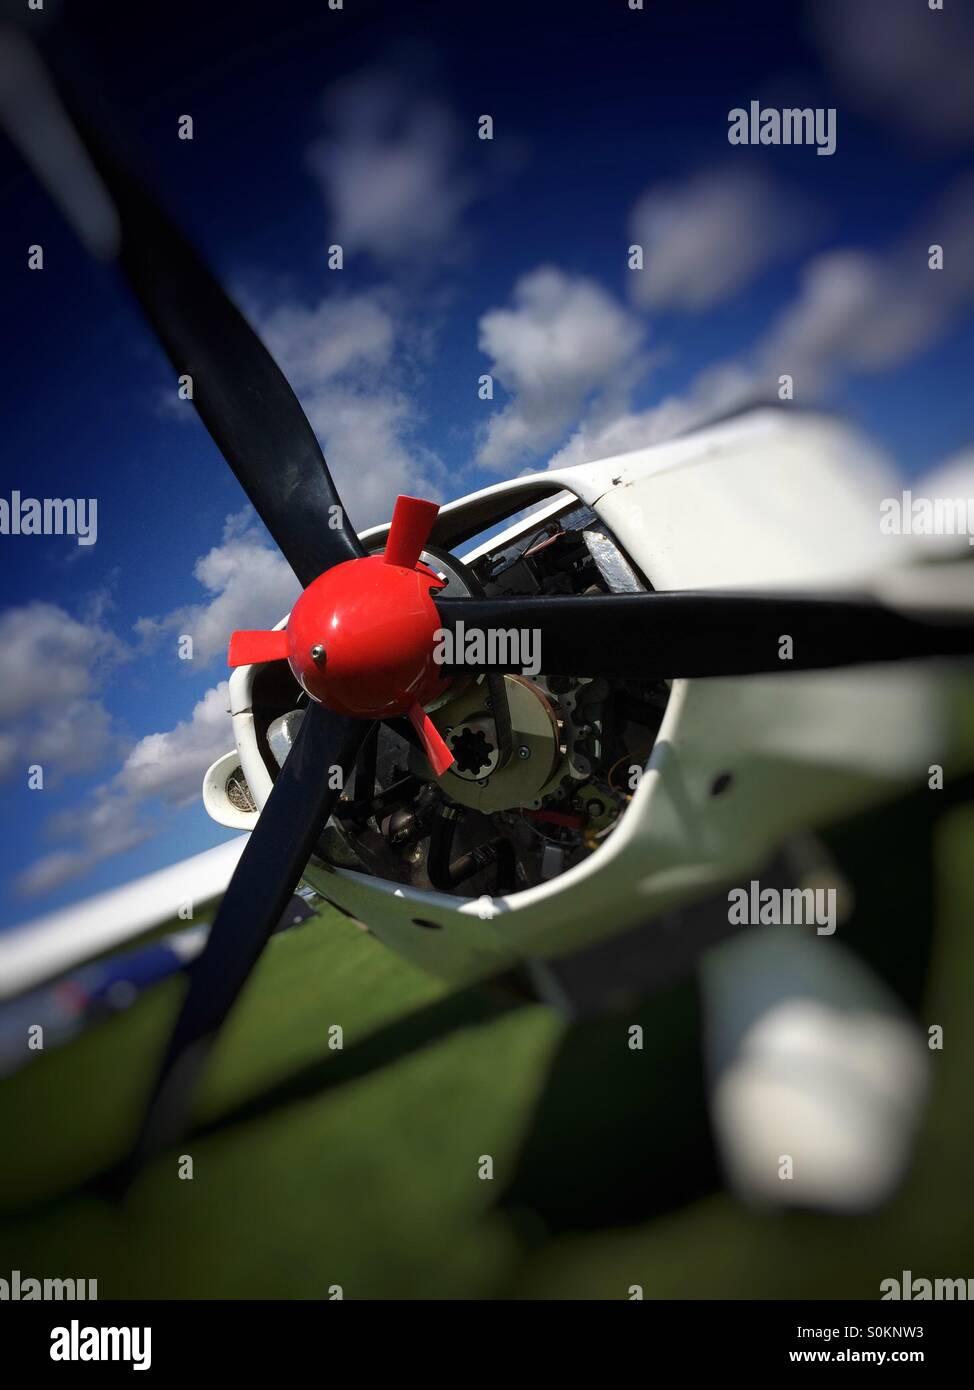 Aircraft propeller - Stock Image